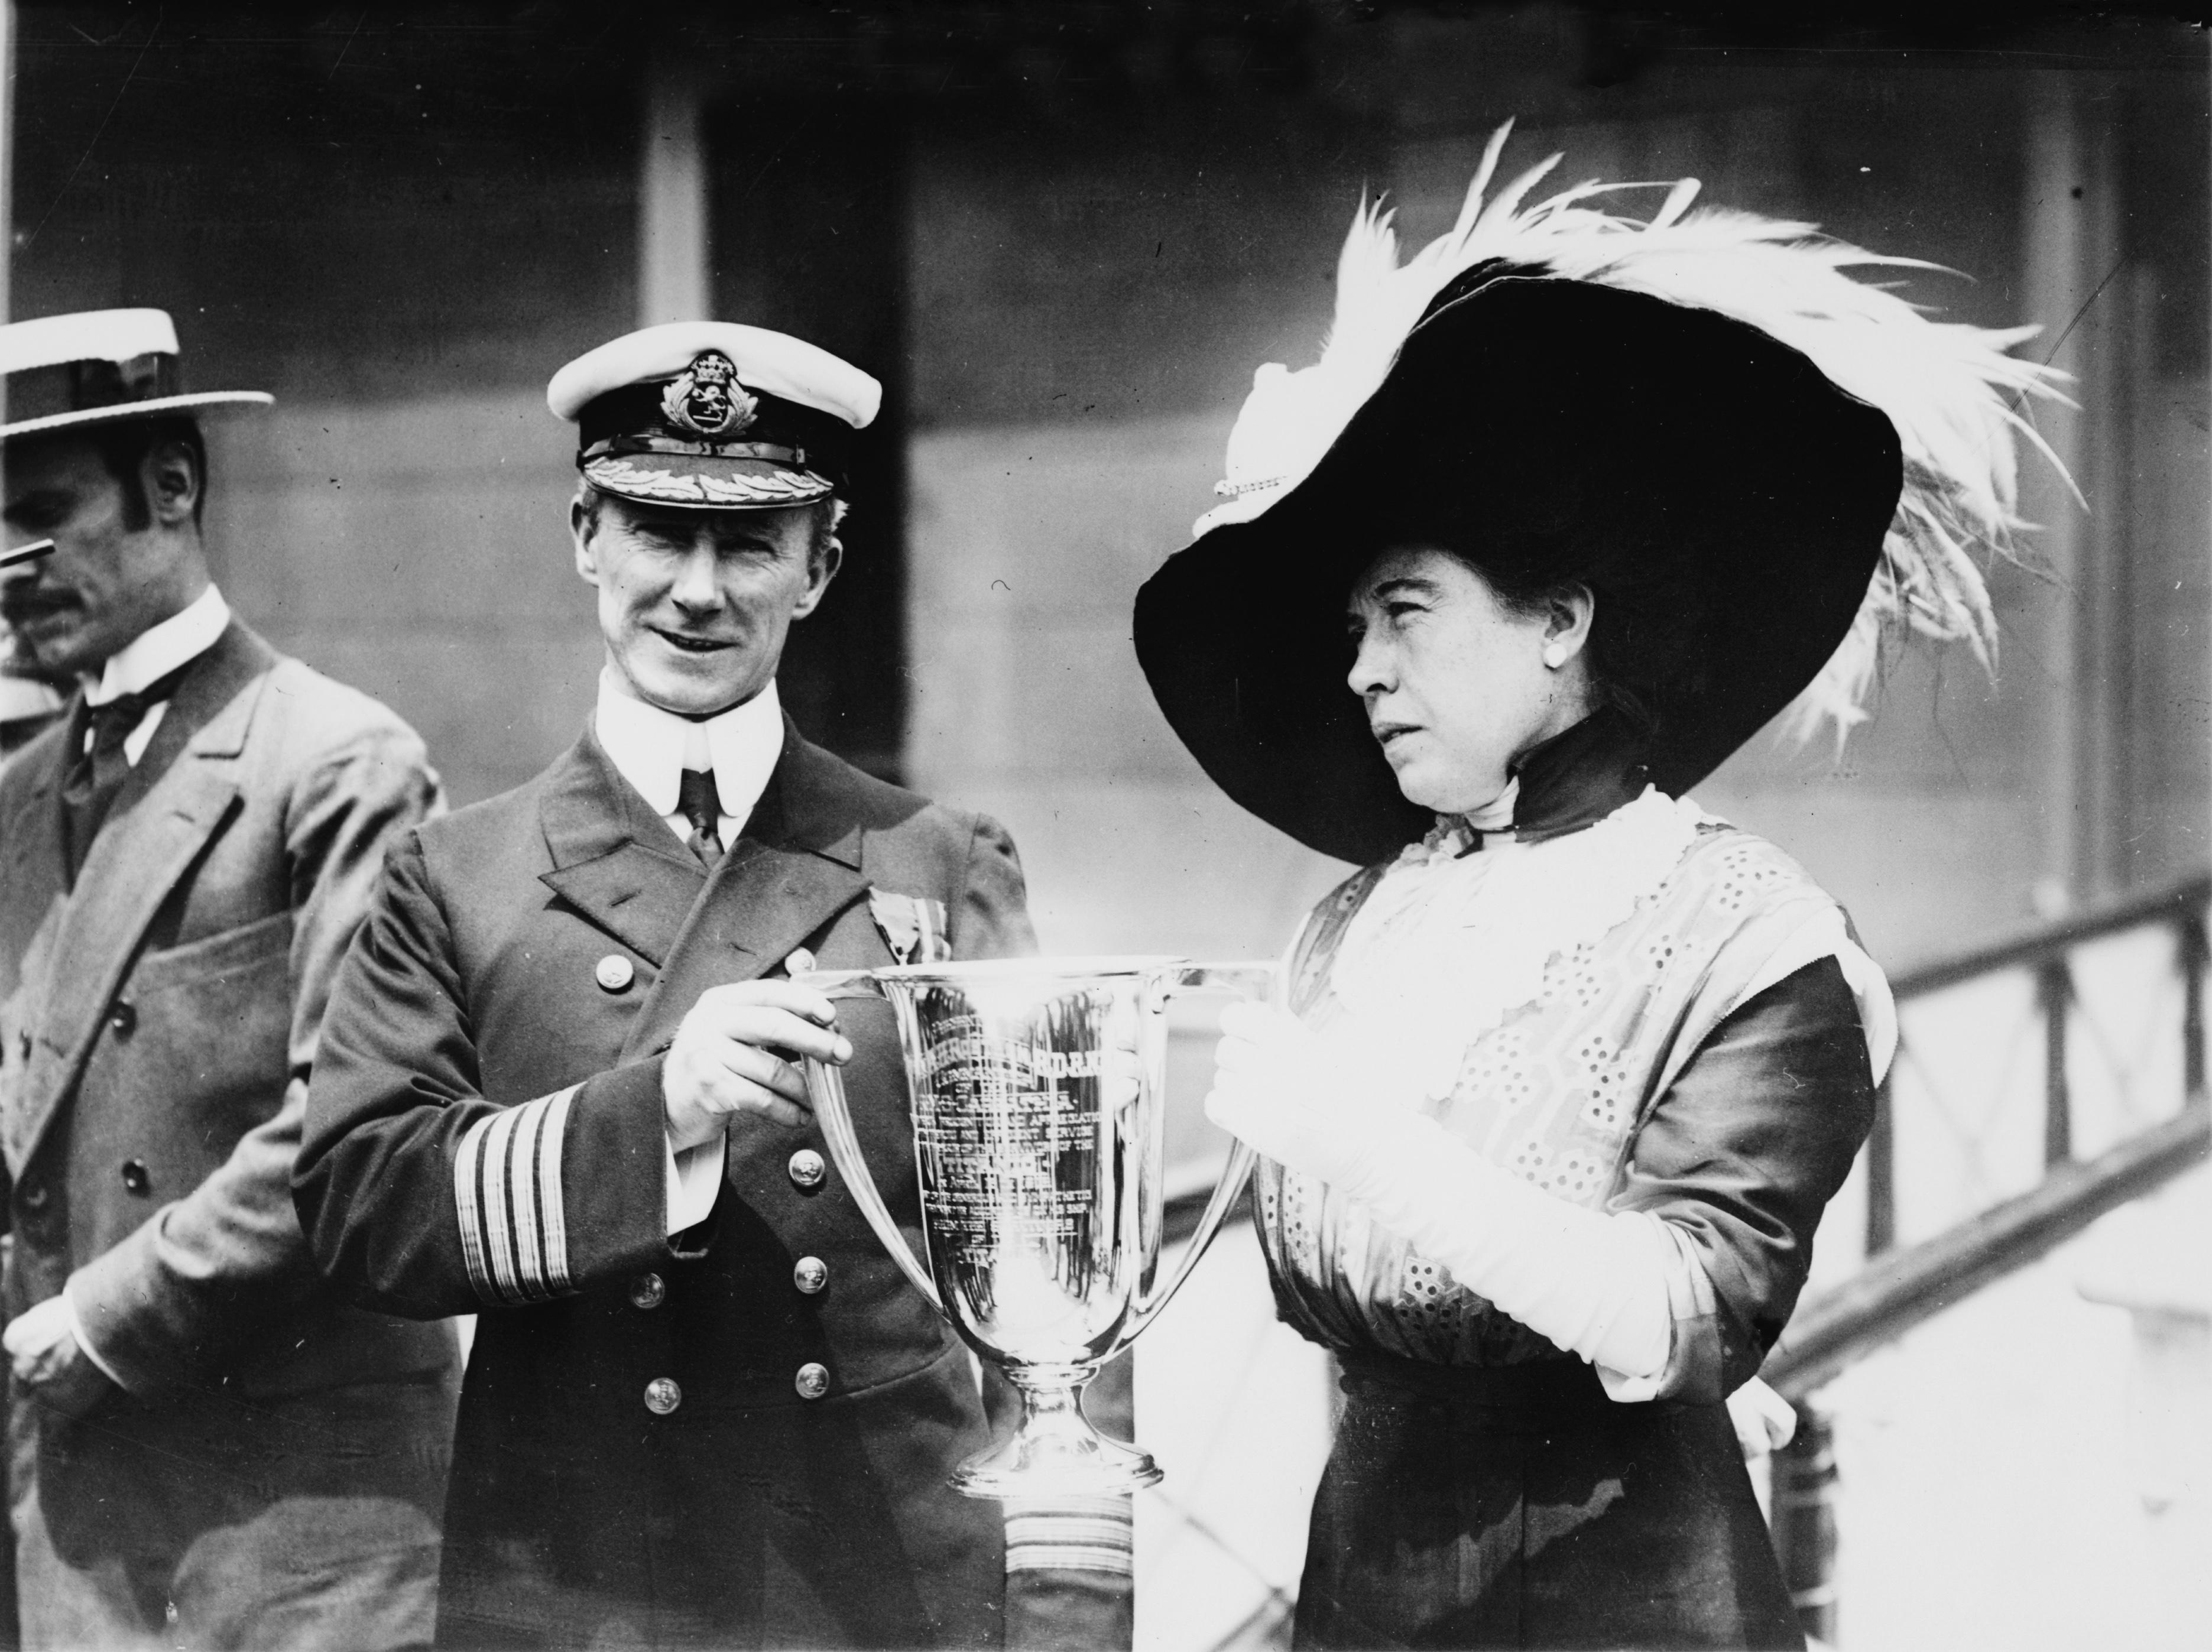 Arthur Rostron's Loving Cup